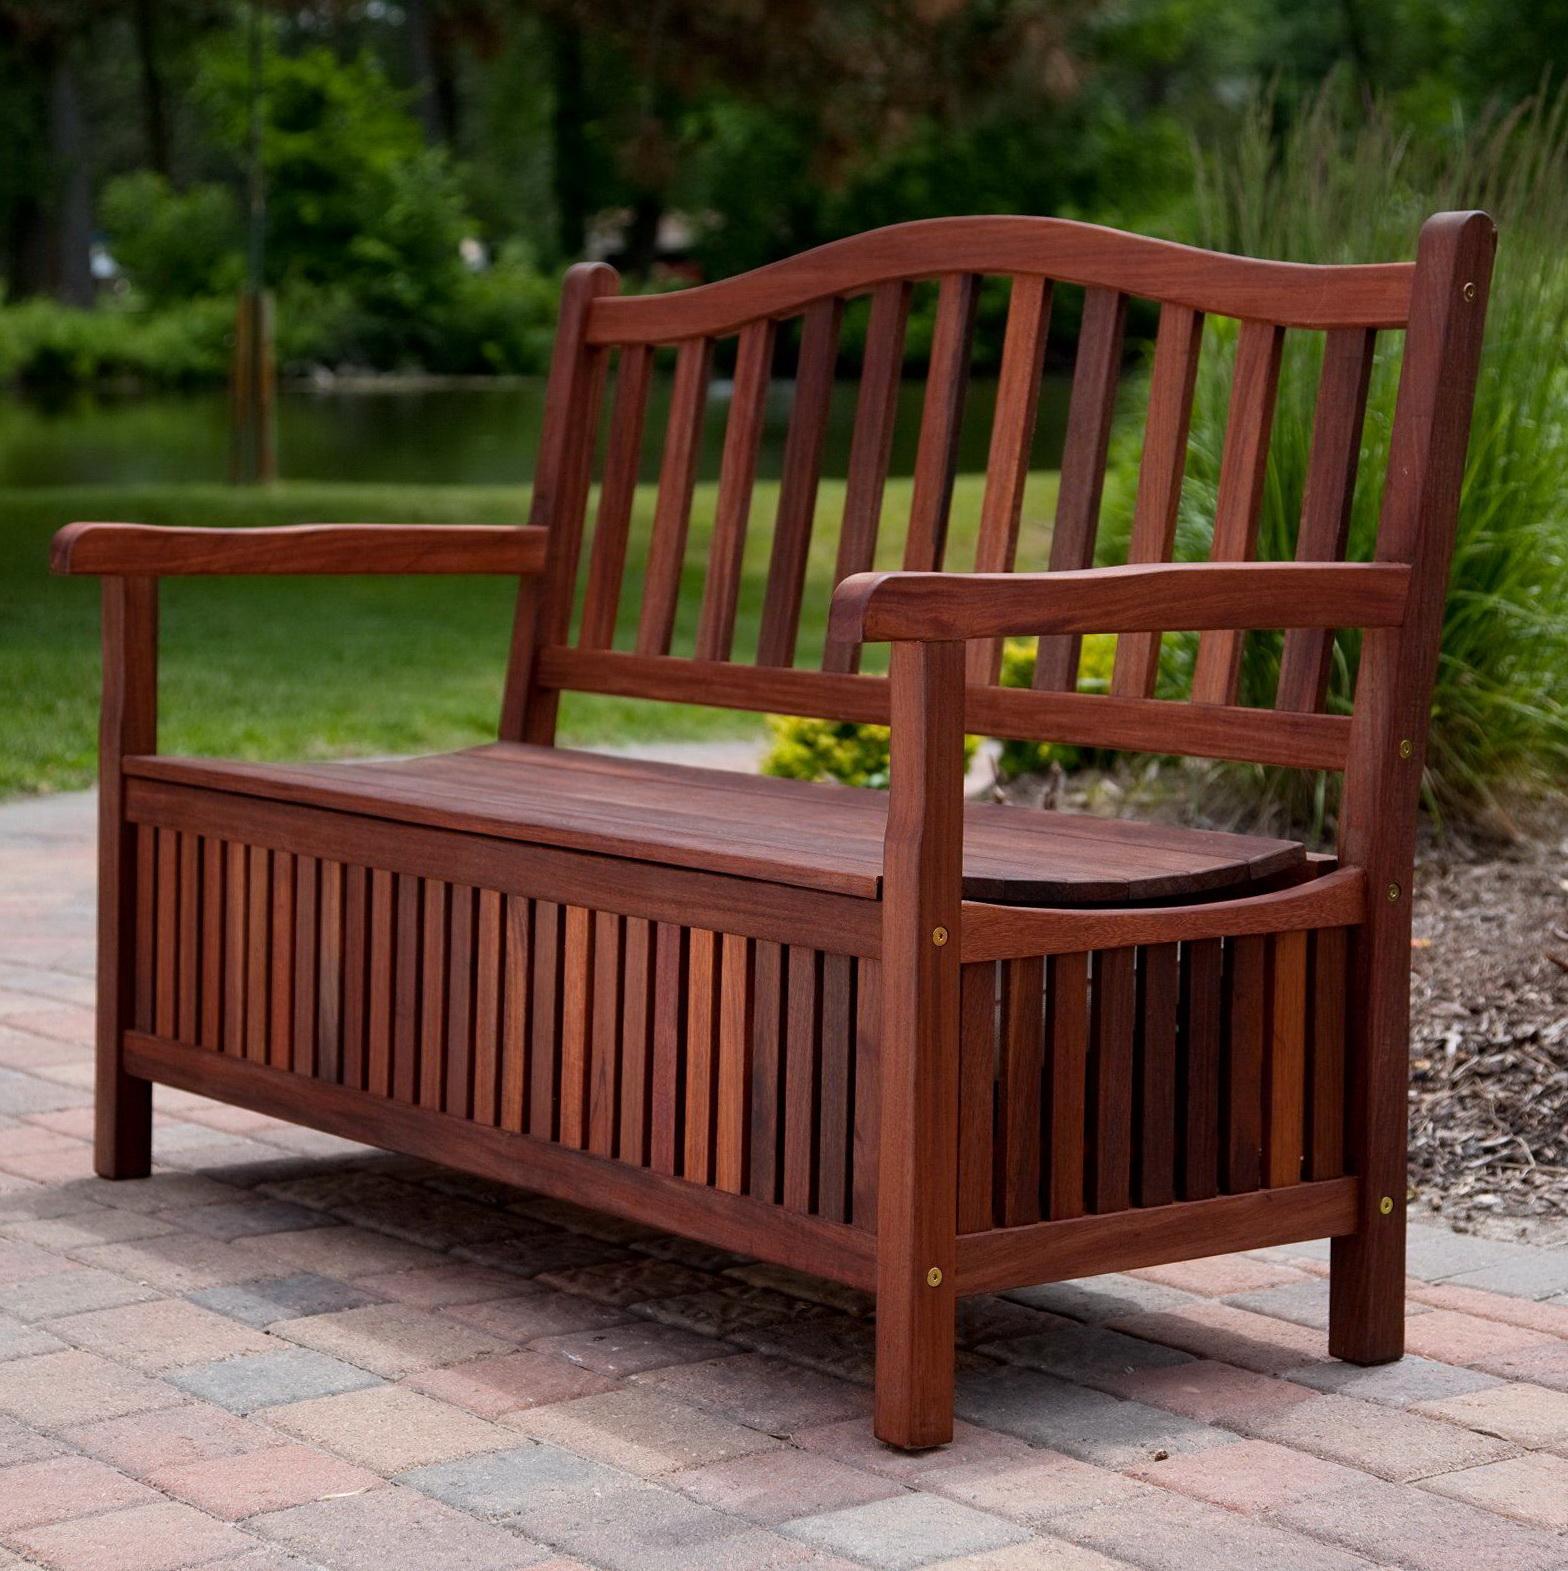 outdoor storage bench seat home design ideas. Black Bedroom Furniture Sets. Home Design Ideas